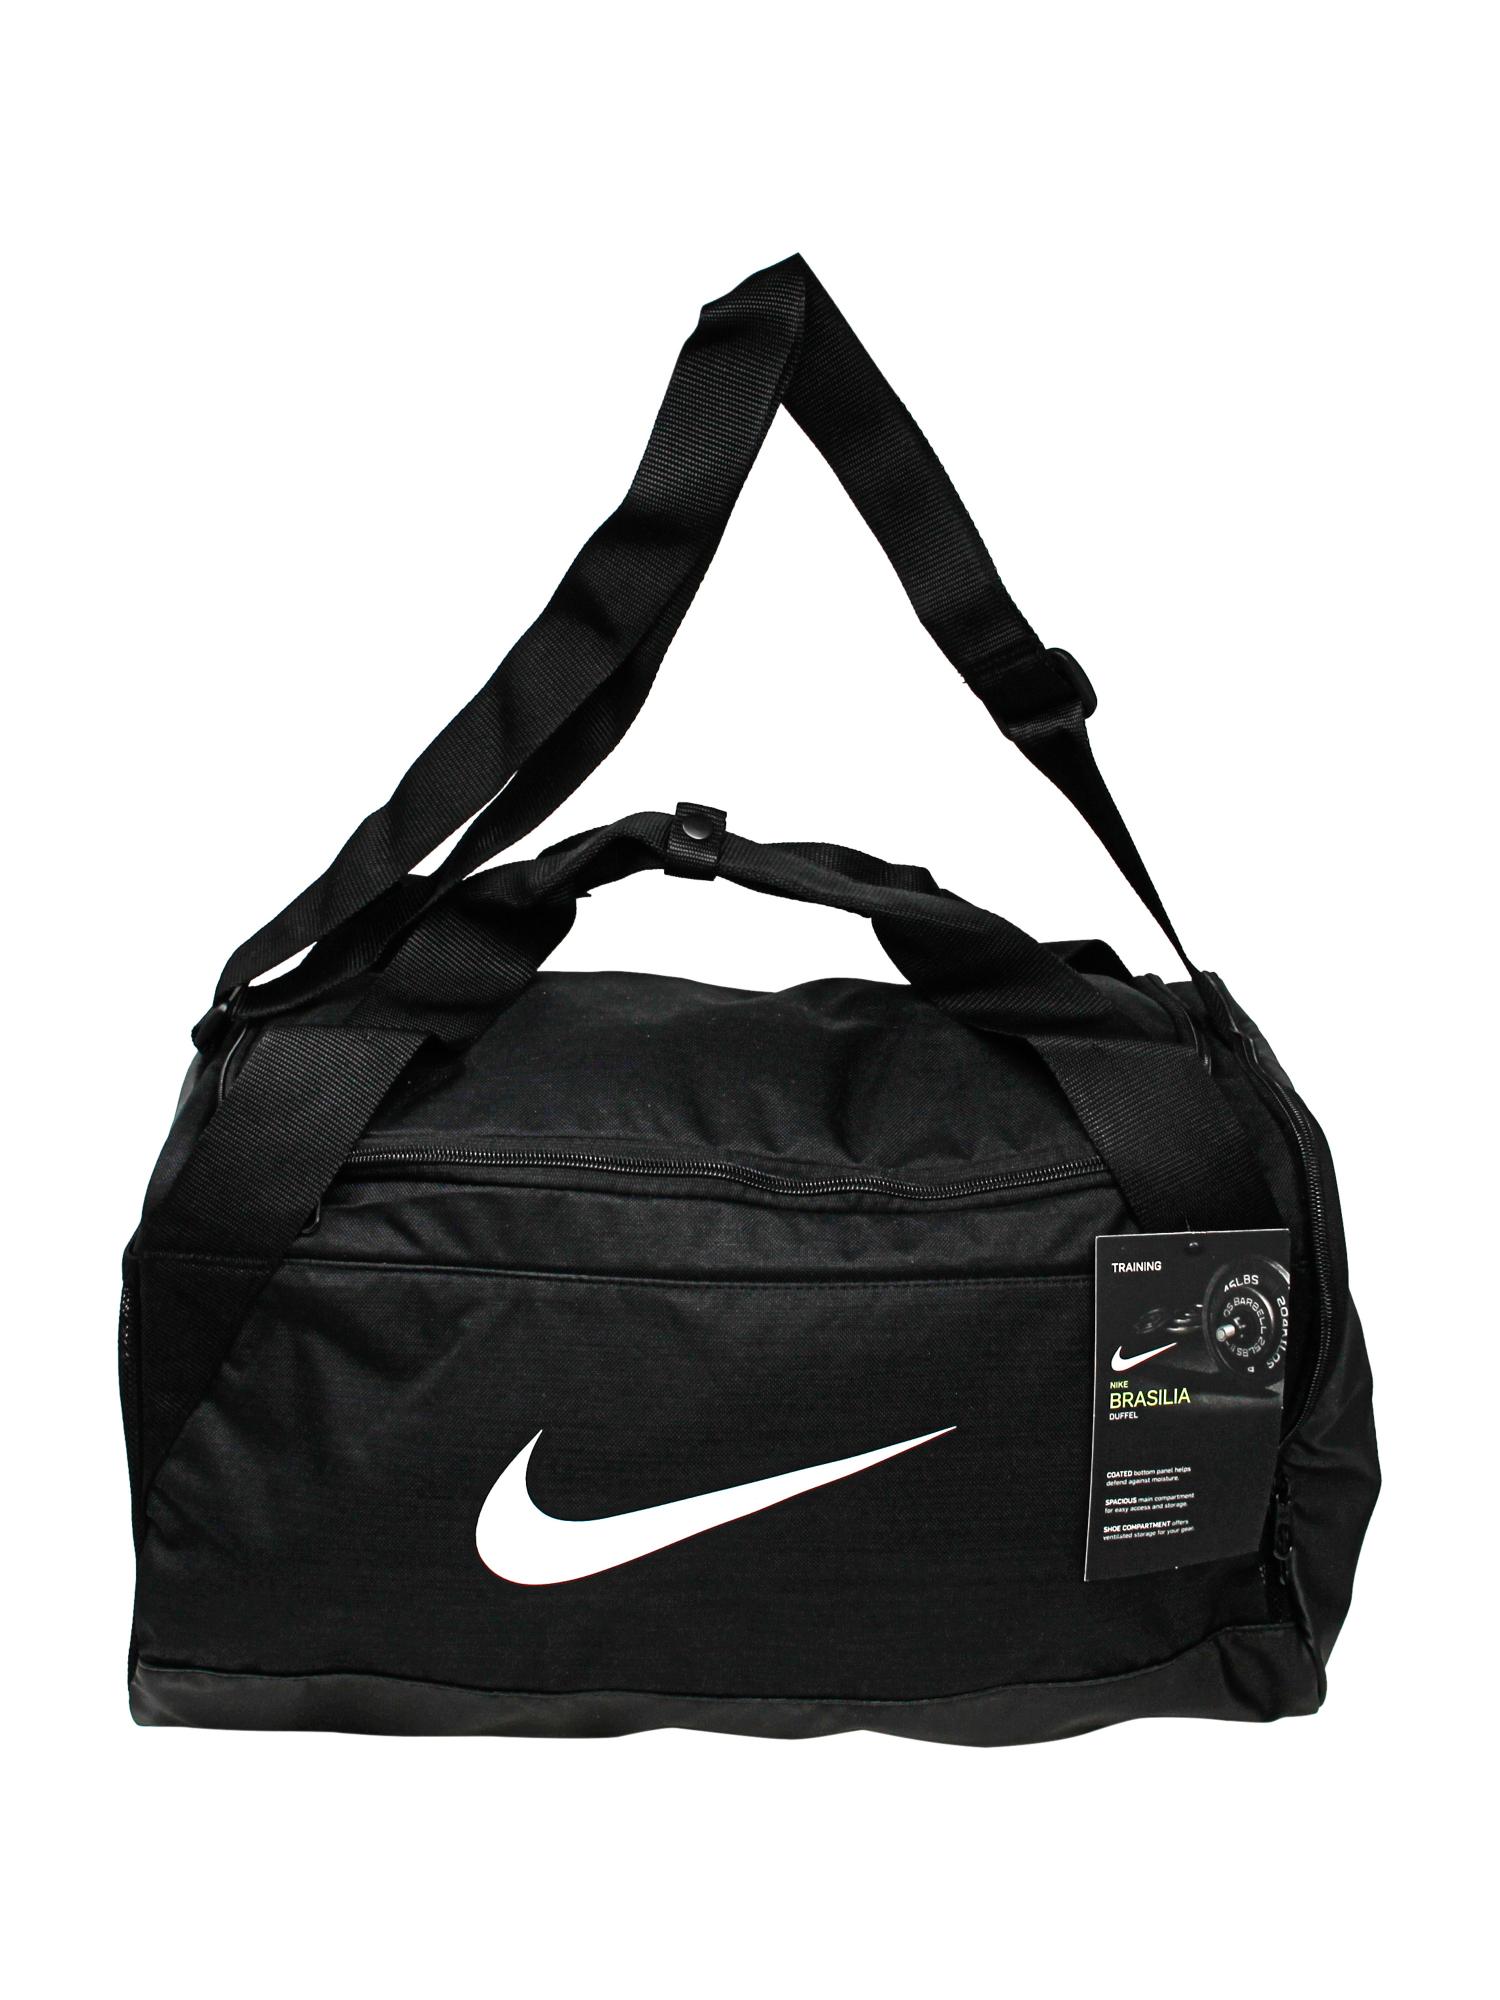 Nike-Brasilia-Small-Duffel-Polyester-Duffle-Bag-Hobo thumbnail 27693ff2aa58d